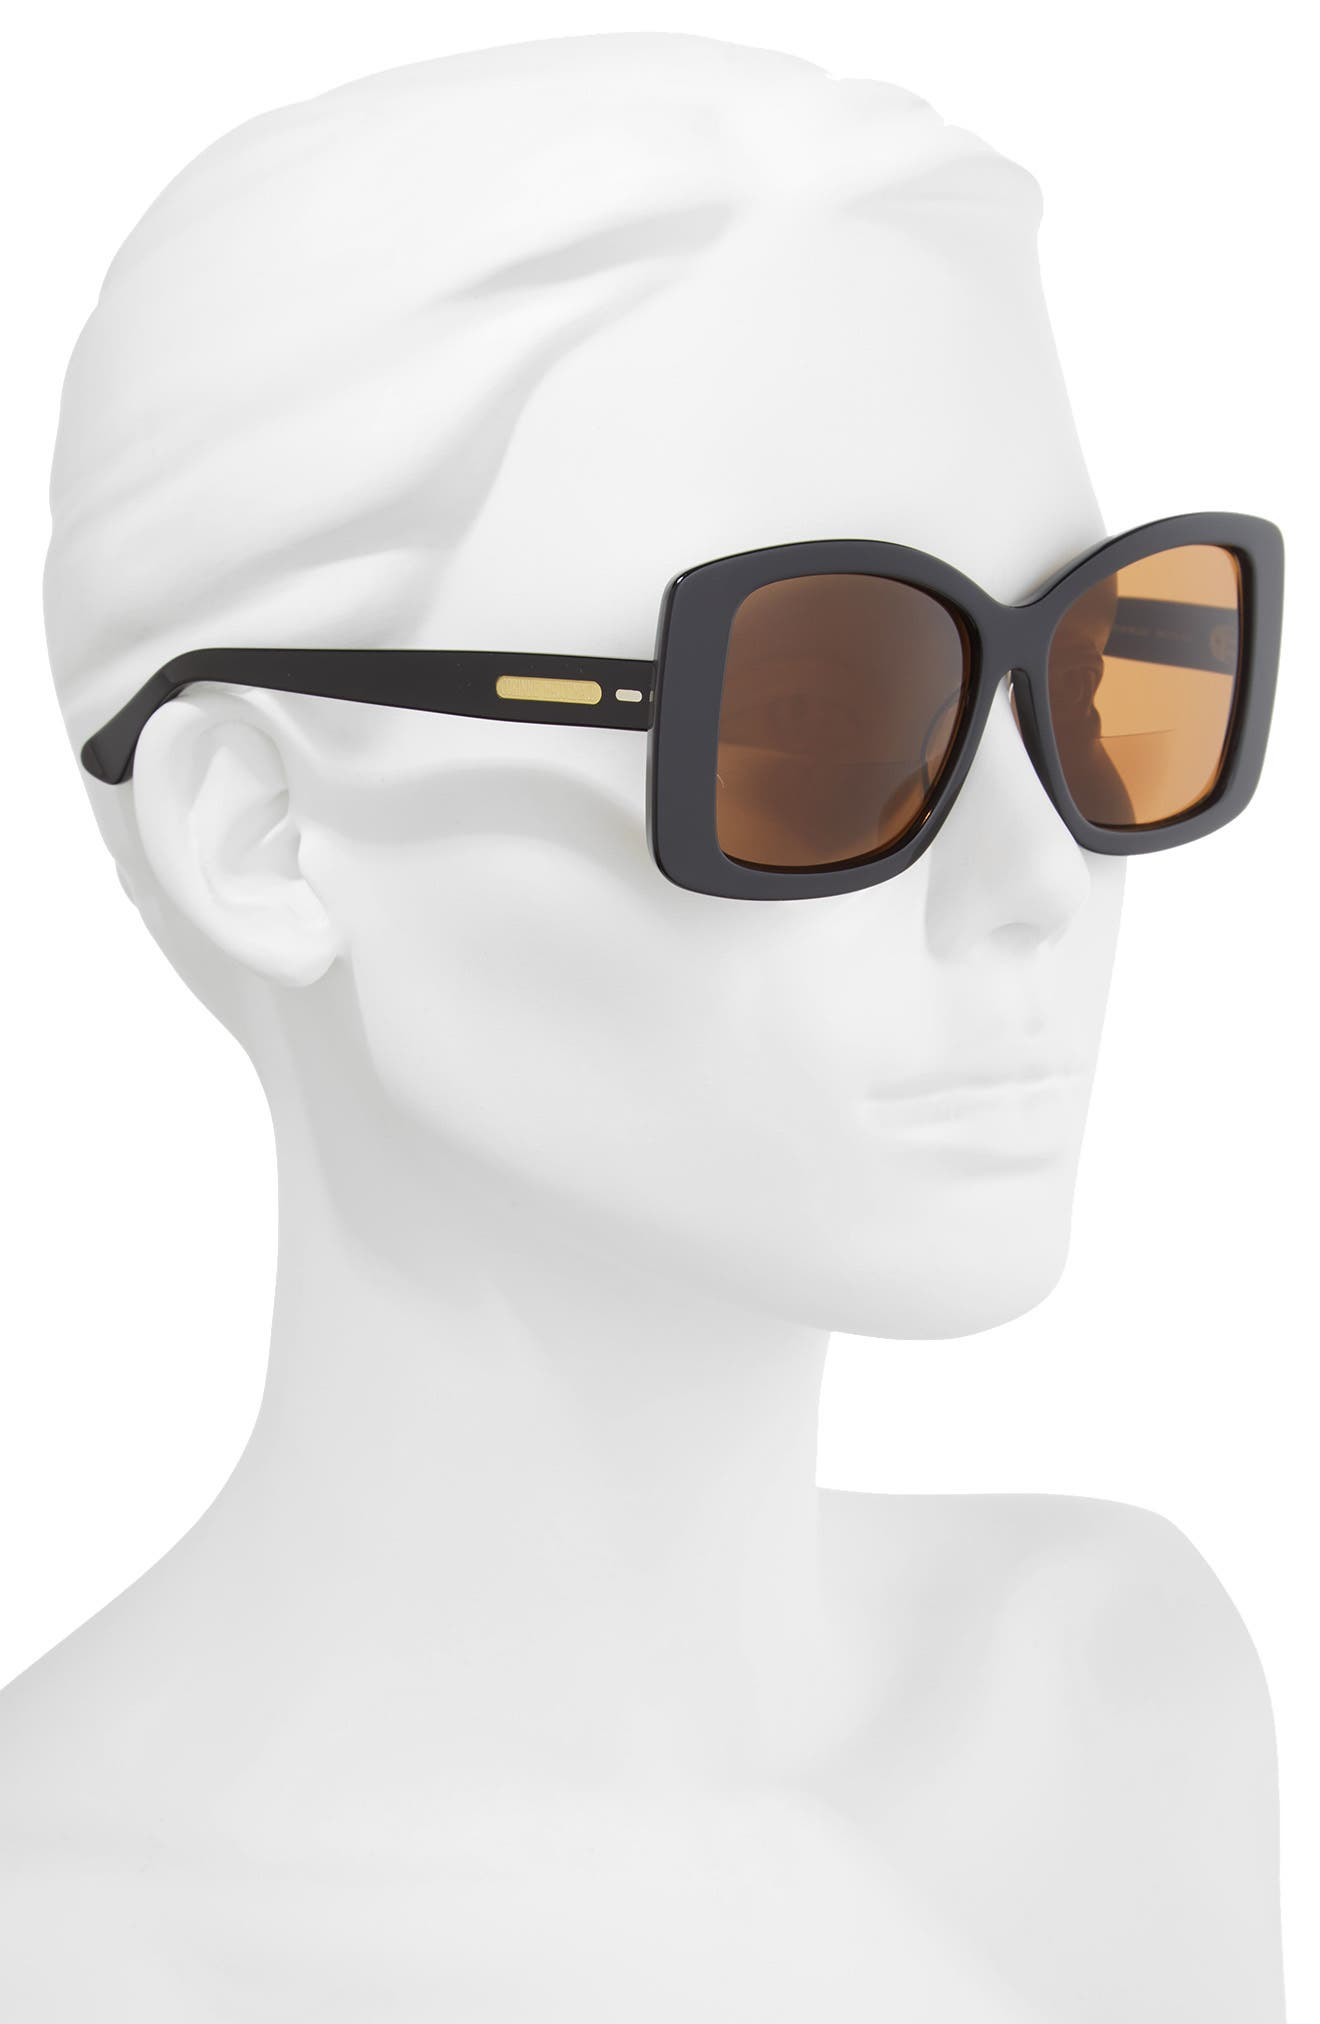 Brooklyn 54mm Reading Sunglasses,                             Alternate thumbnail 2, color,                             001